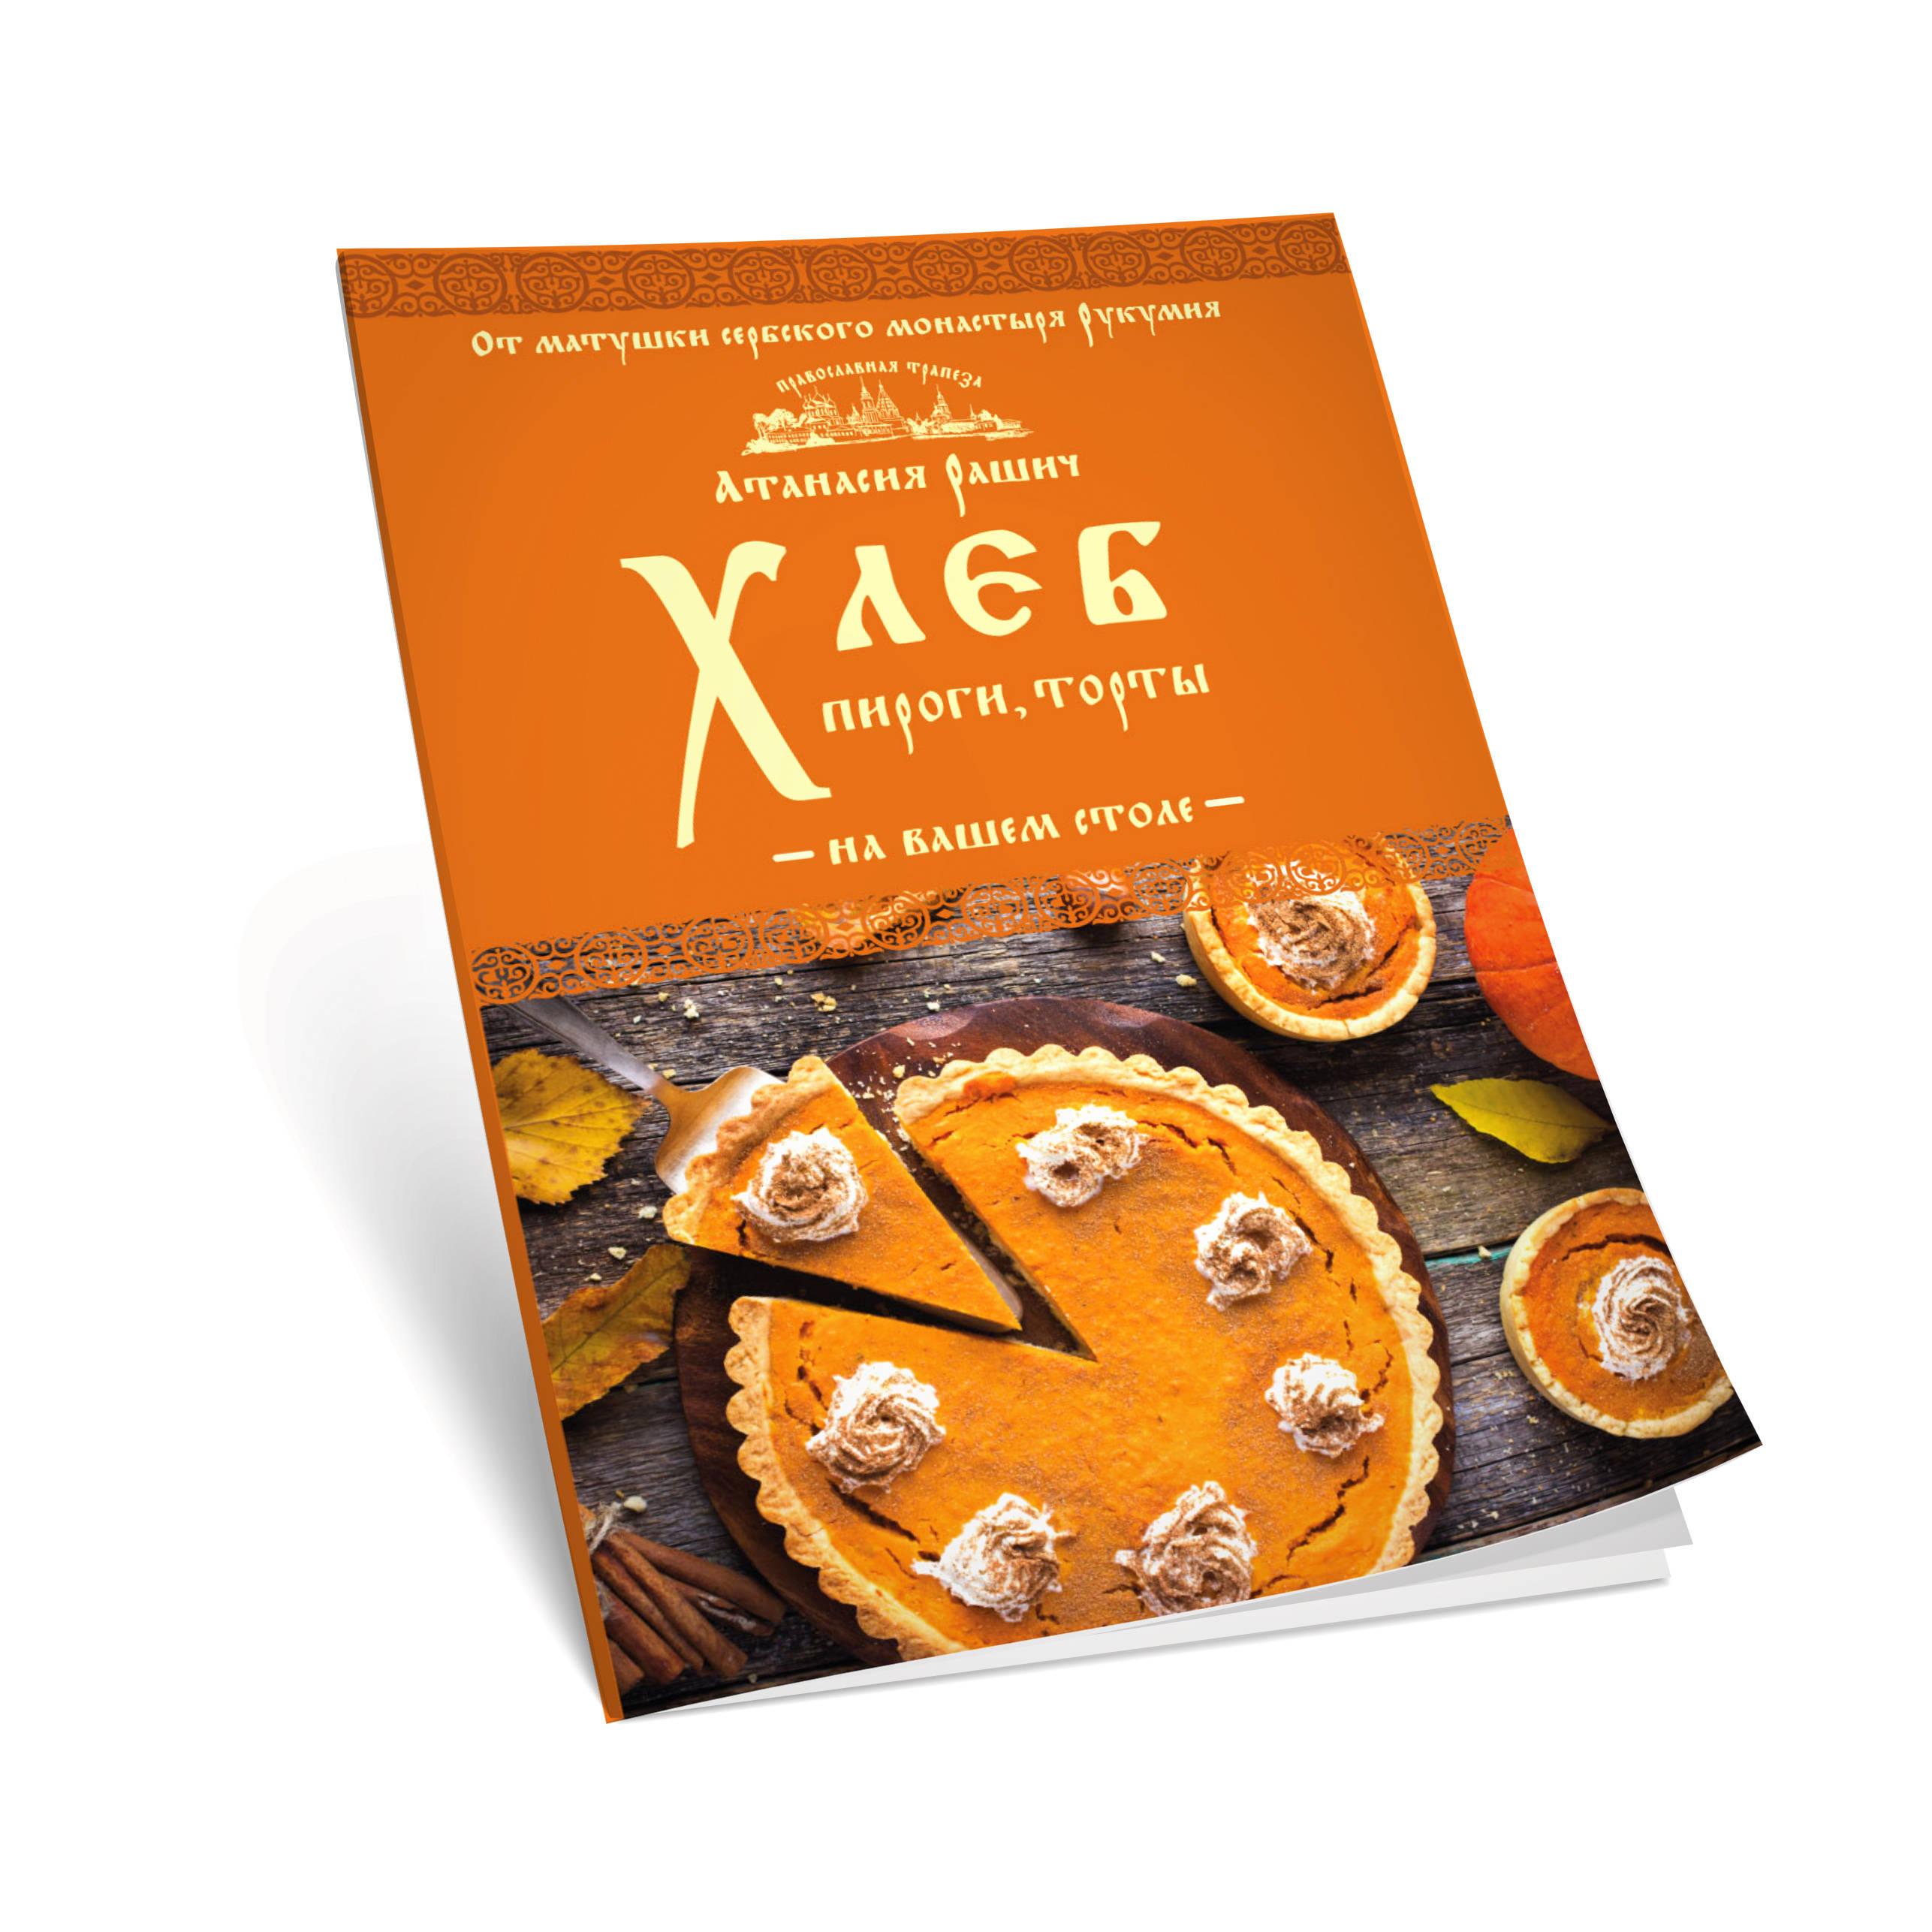 Рашич А. Хлеб, пироги, торты на вашем столе готовим пироги торты хлеб и кое что еще